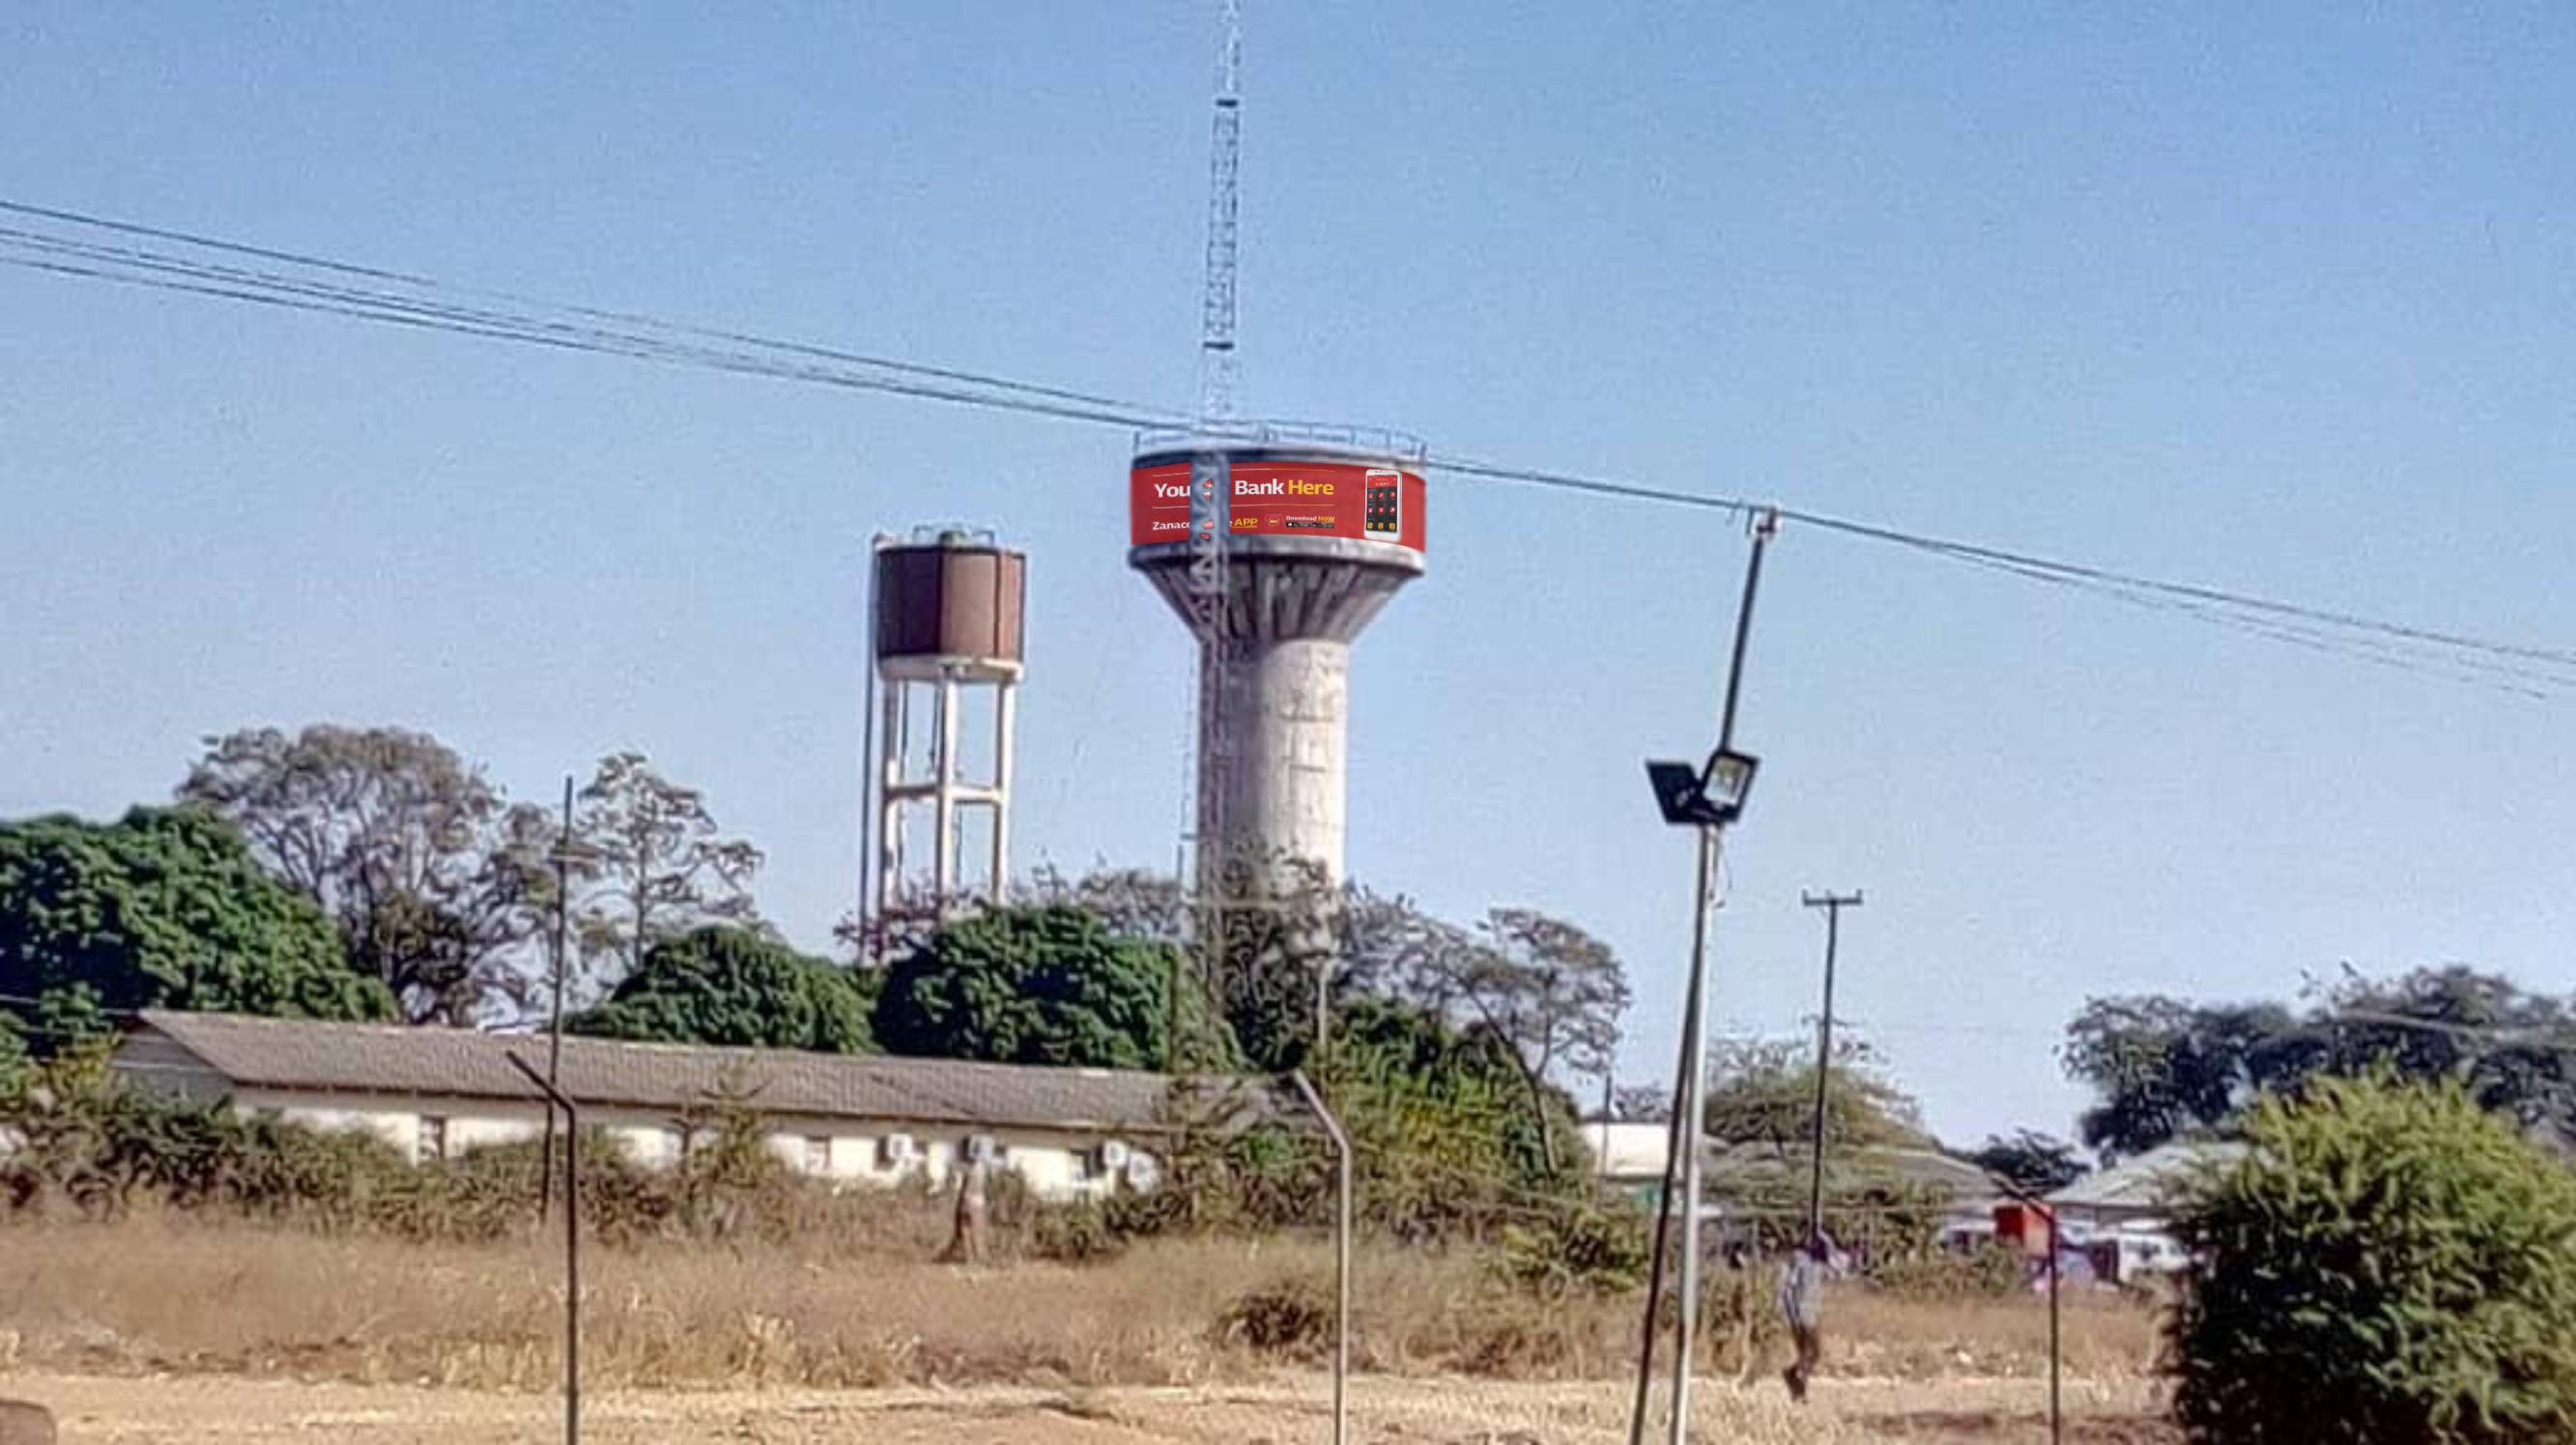 Choma Tower